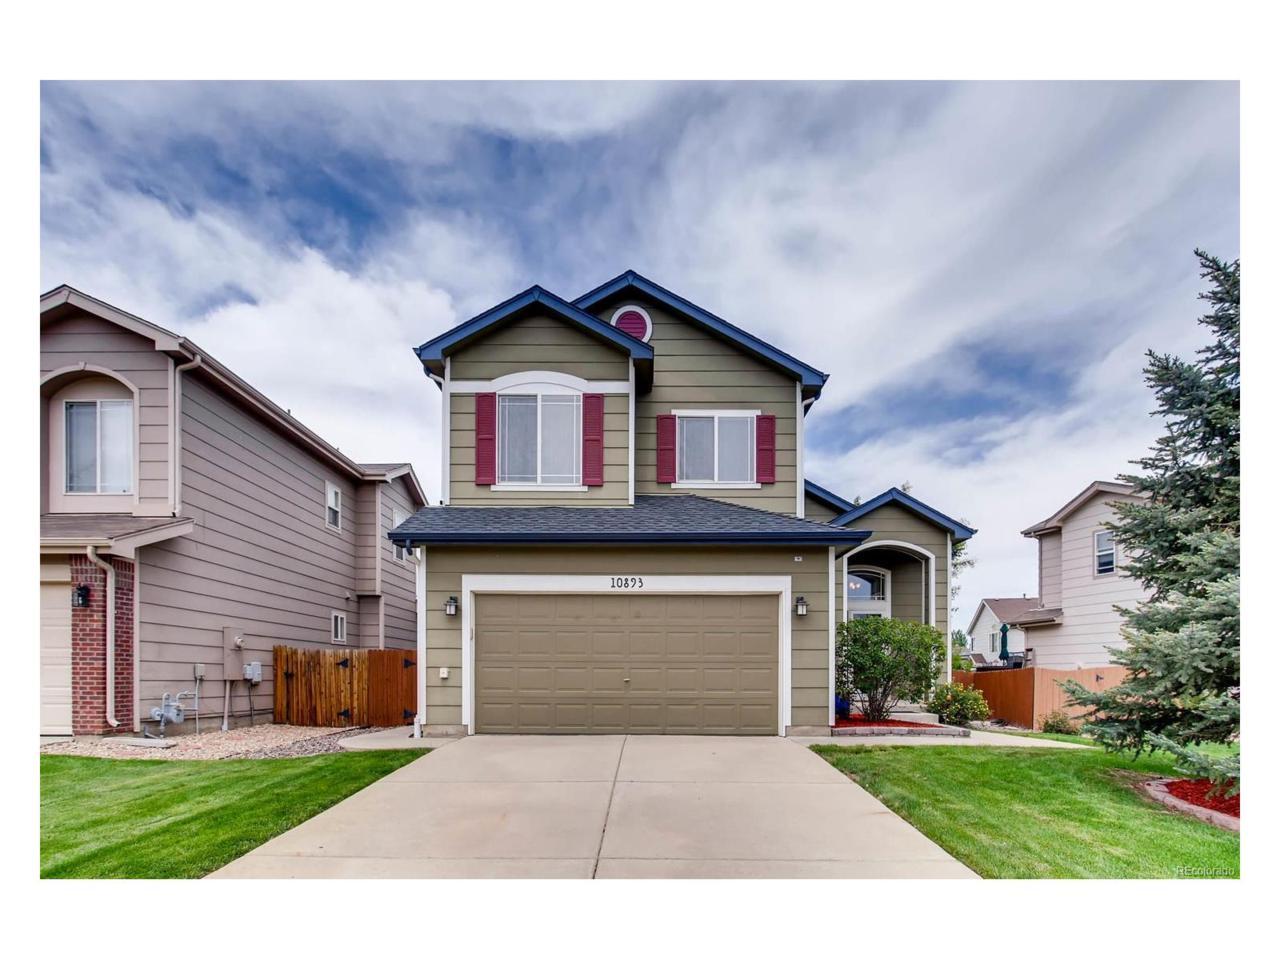 10893 Bullock Court, Parker, CO 80134 (MLS #5466774) :: 8z Real Estate